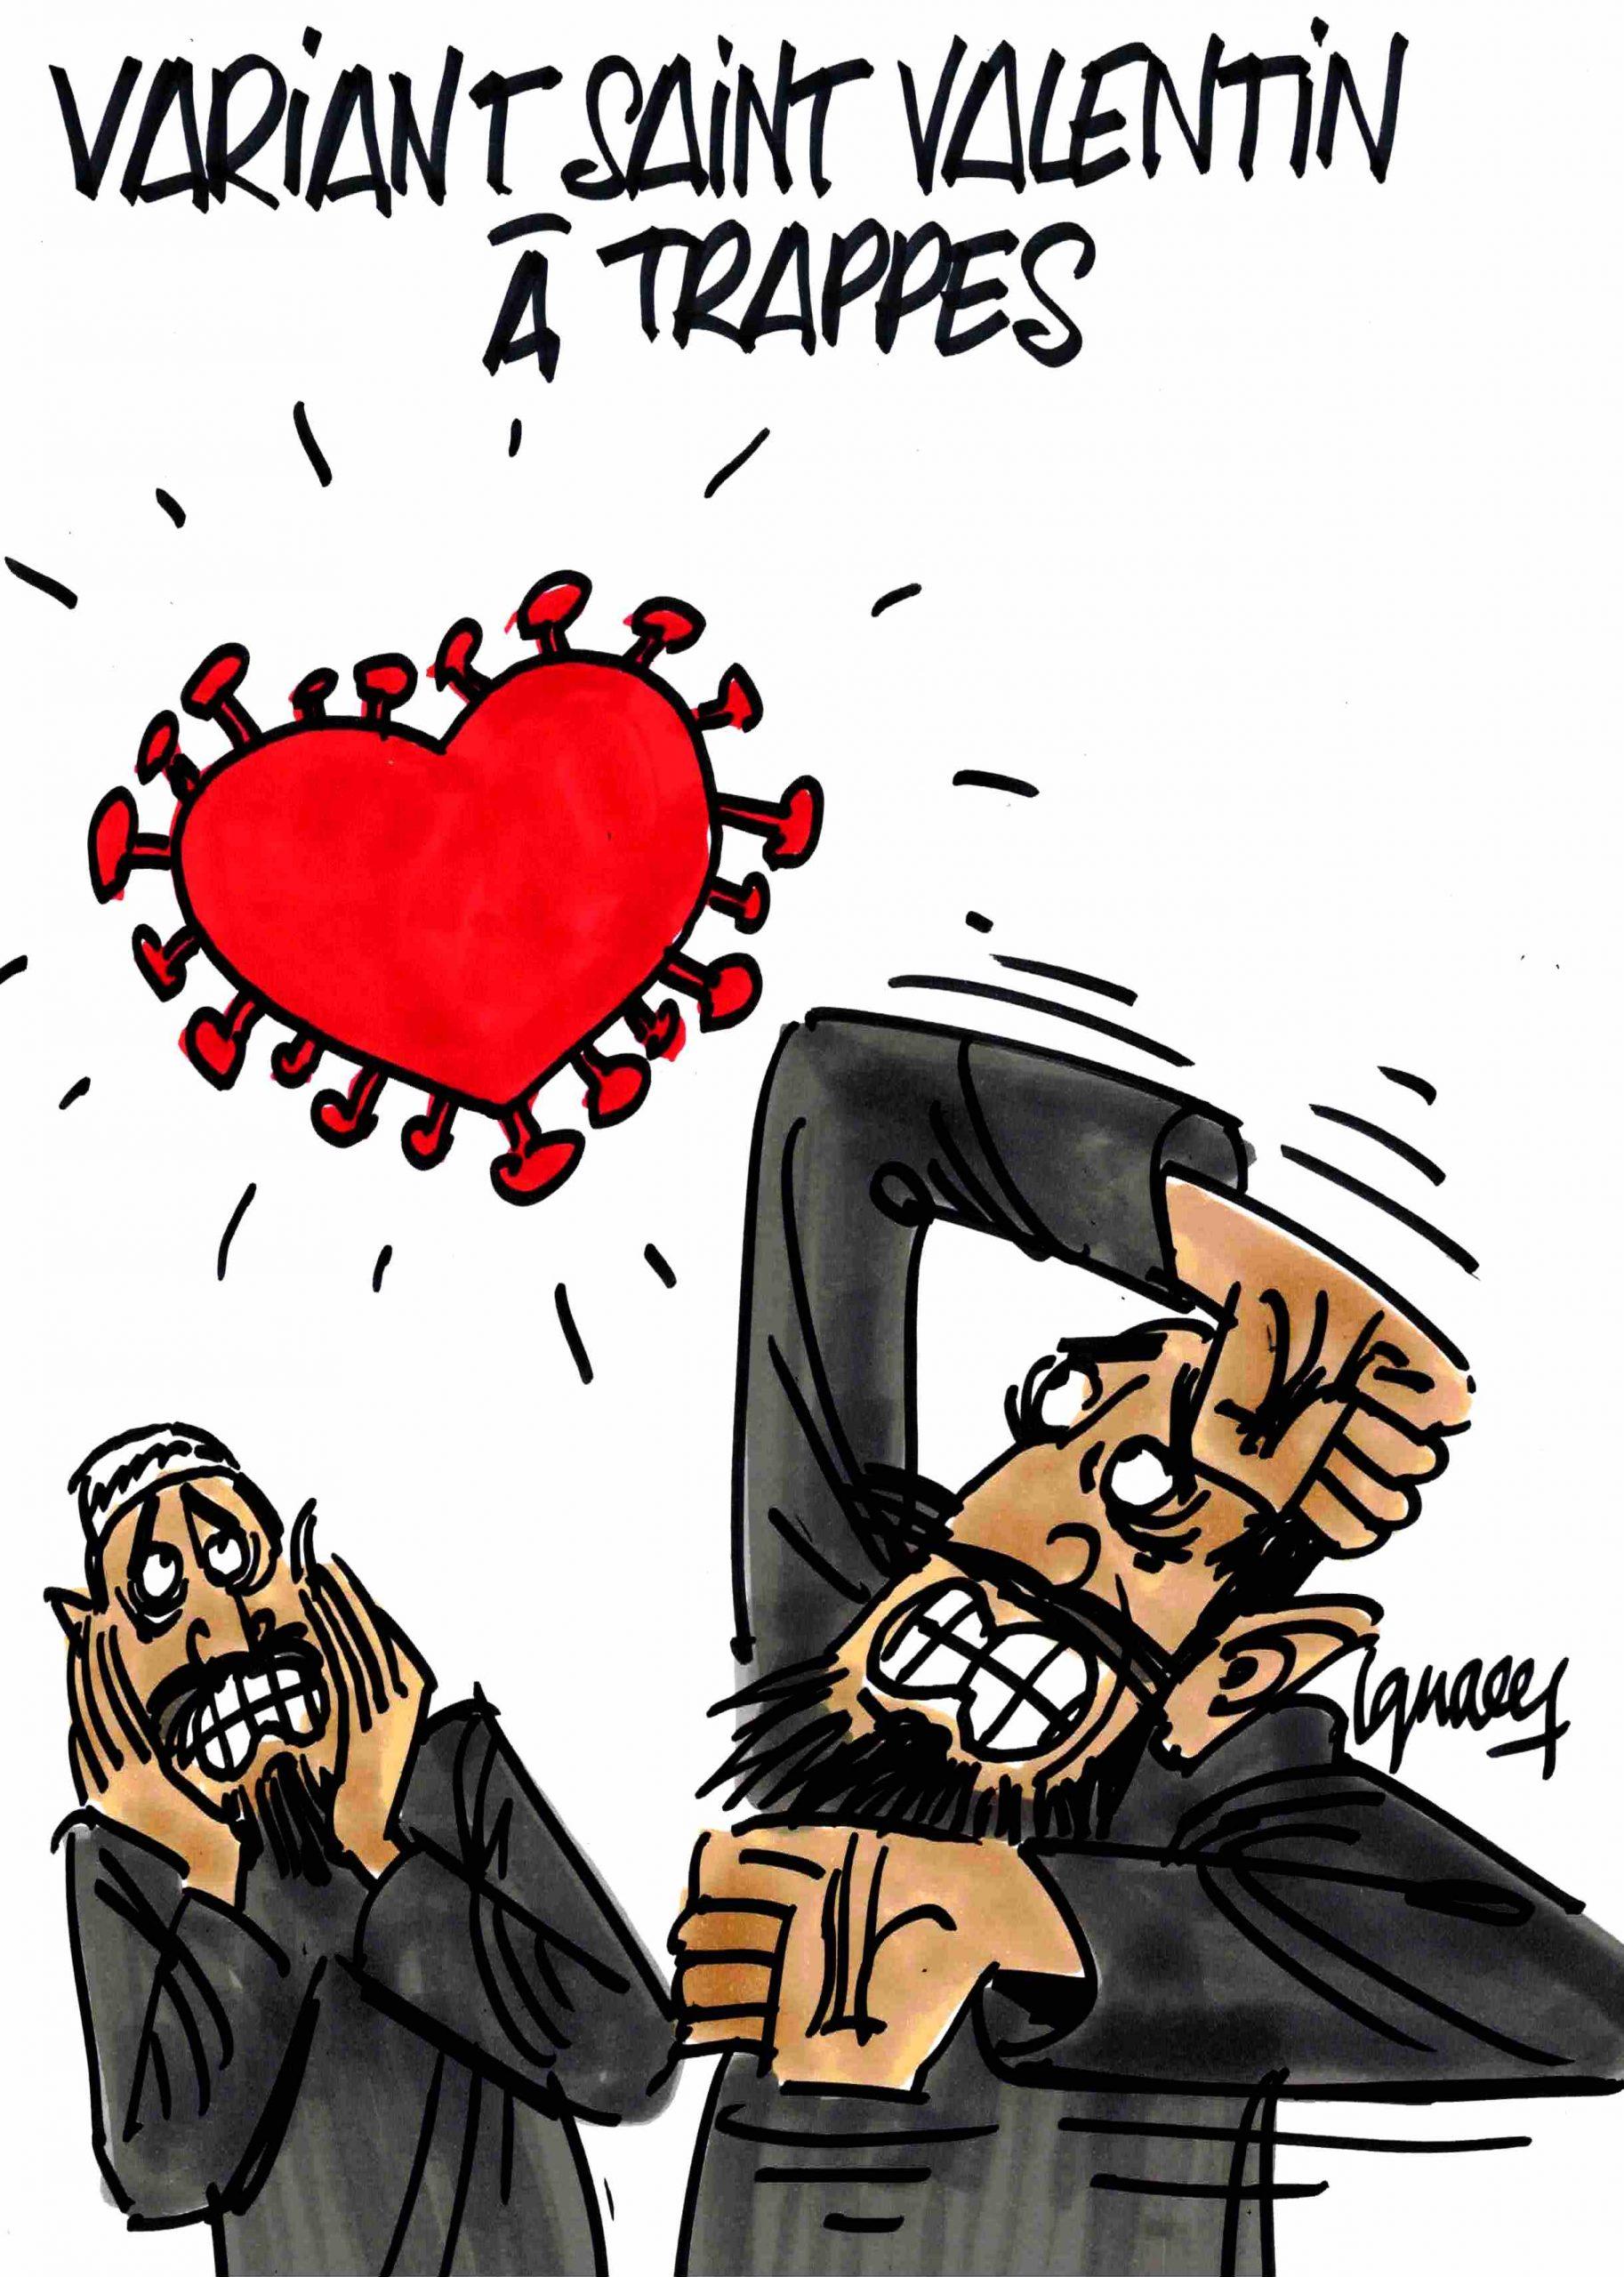 Ignace - Variant saint Valentin à Trappes